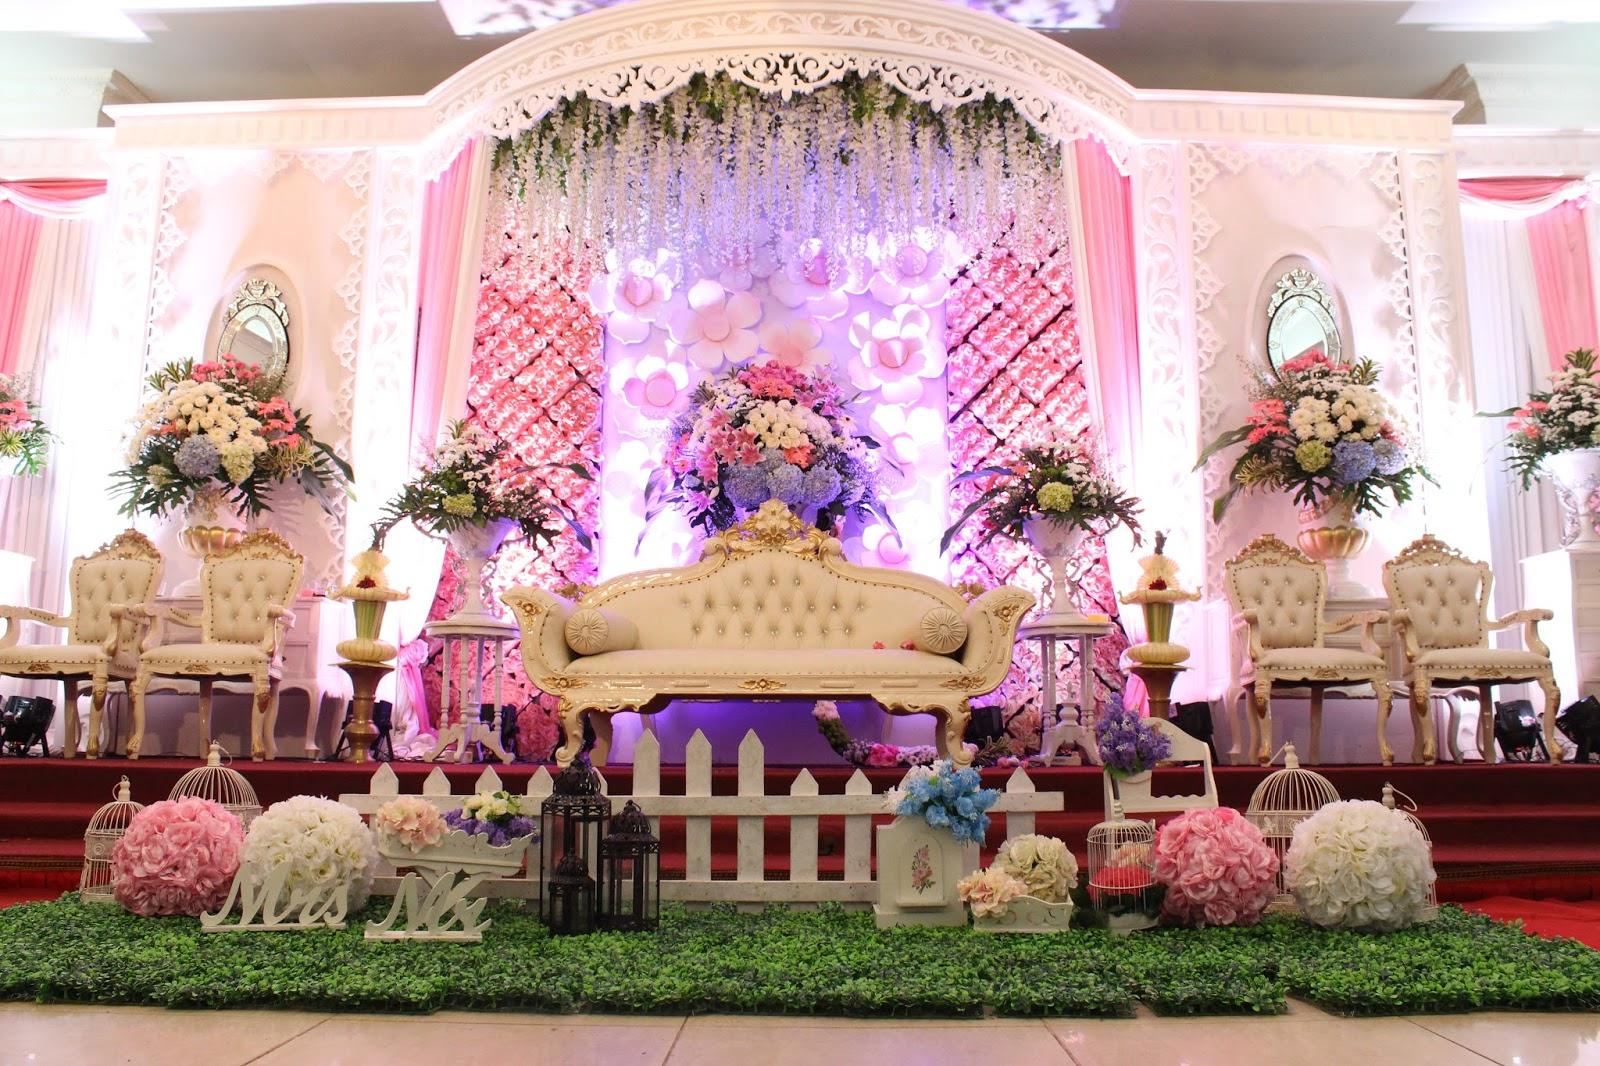 Jasa Dekorasi Pernikahan Malang